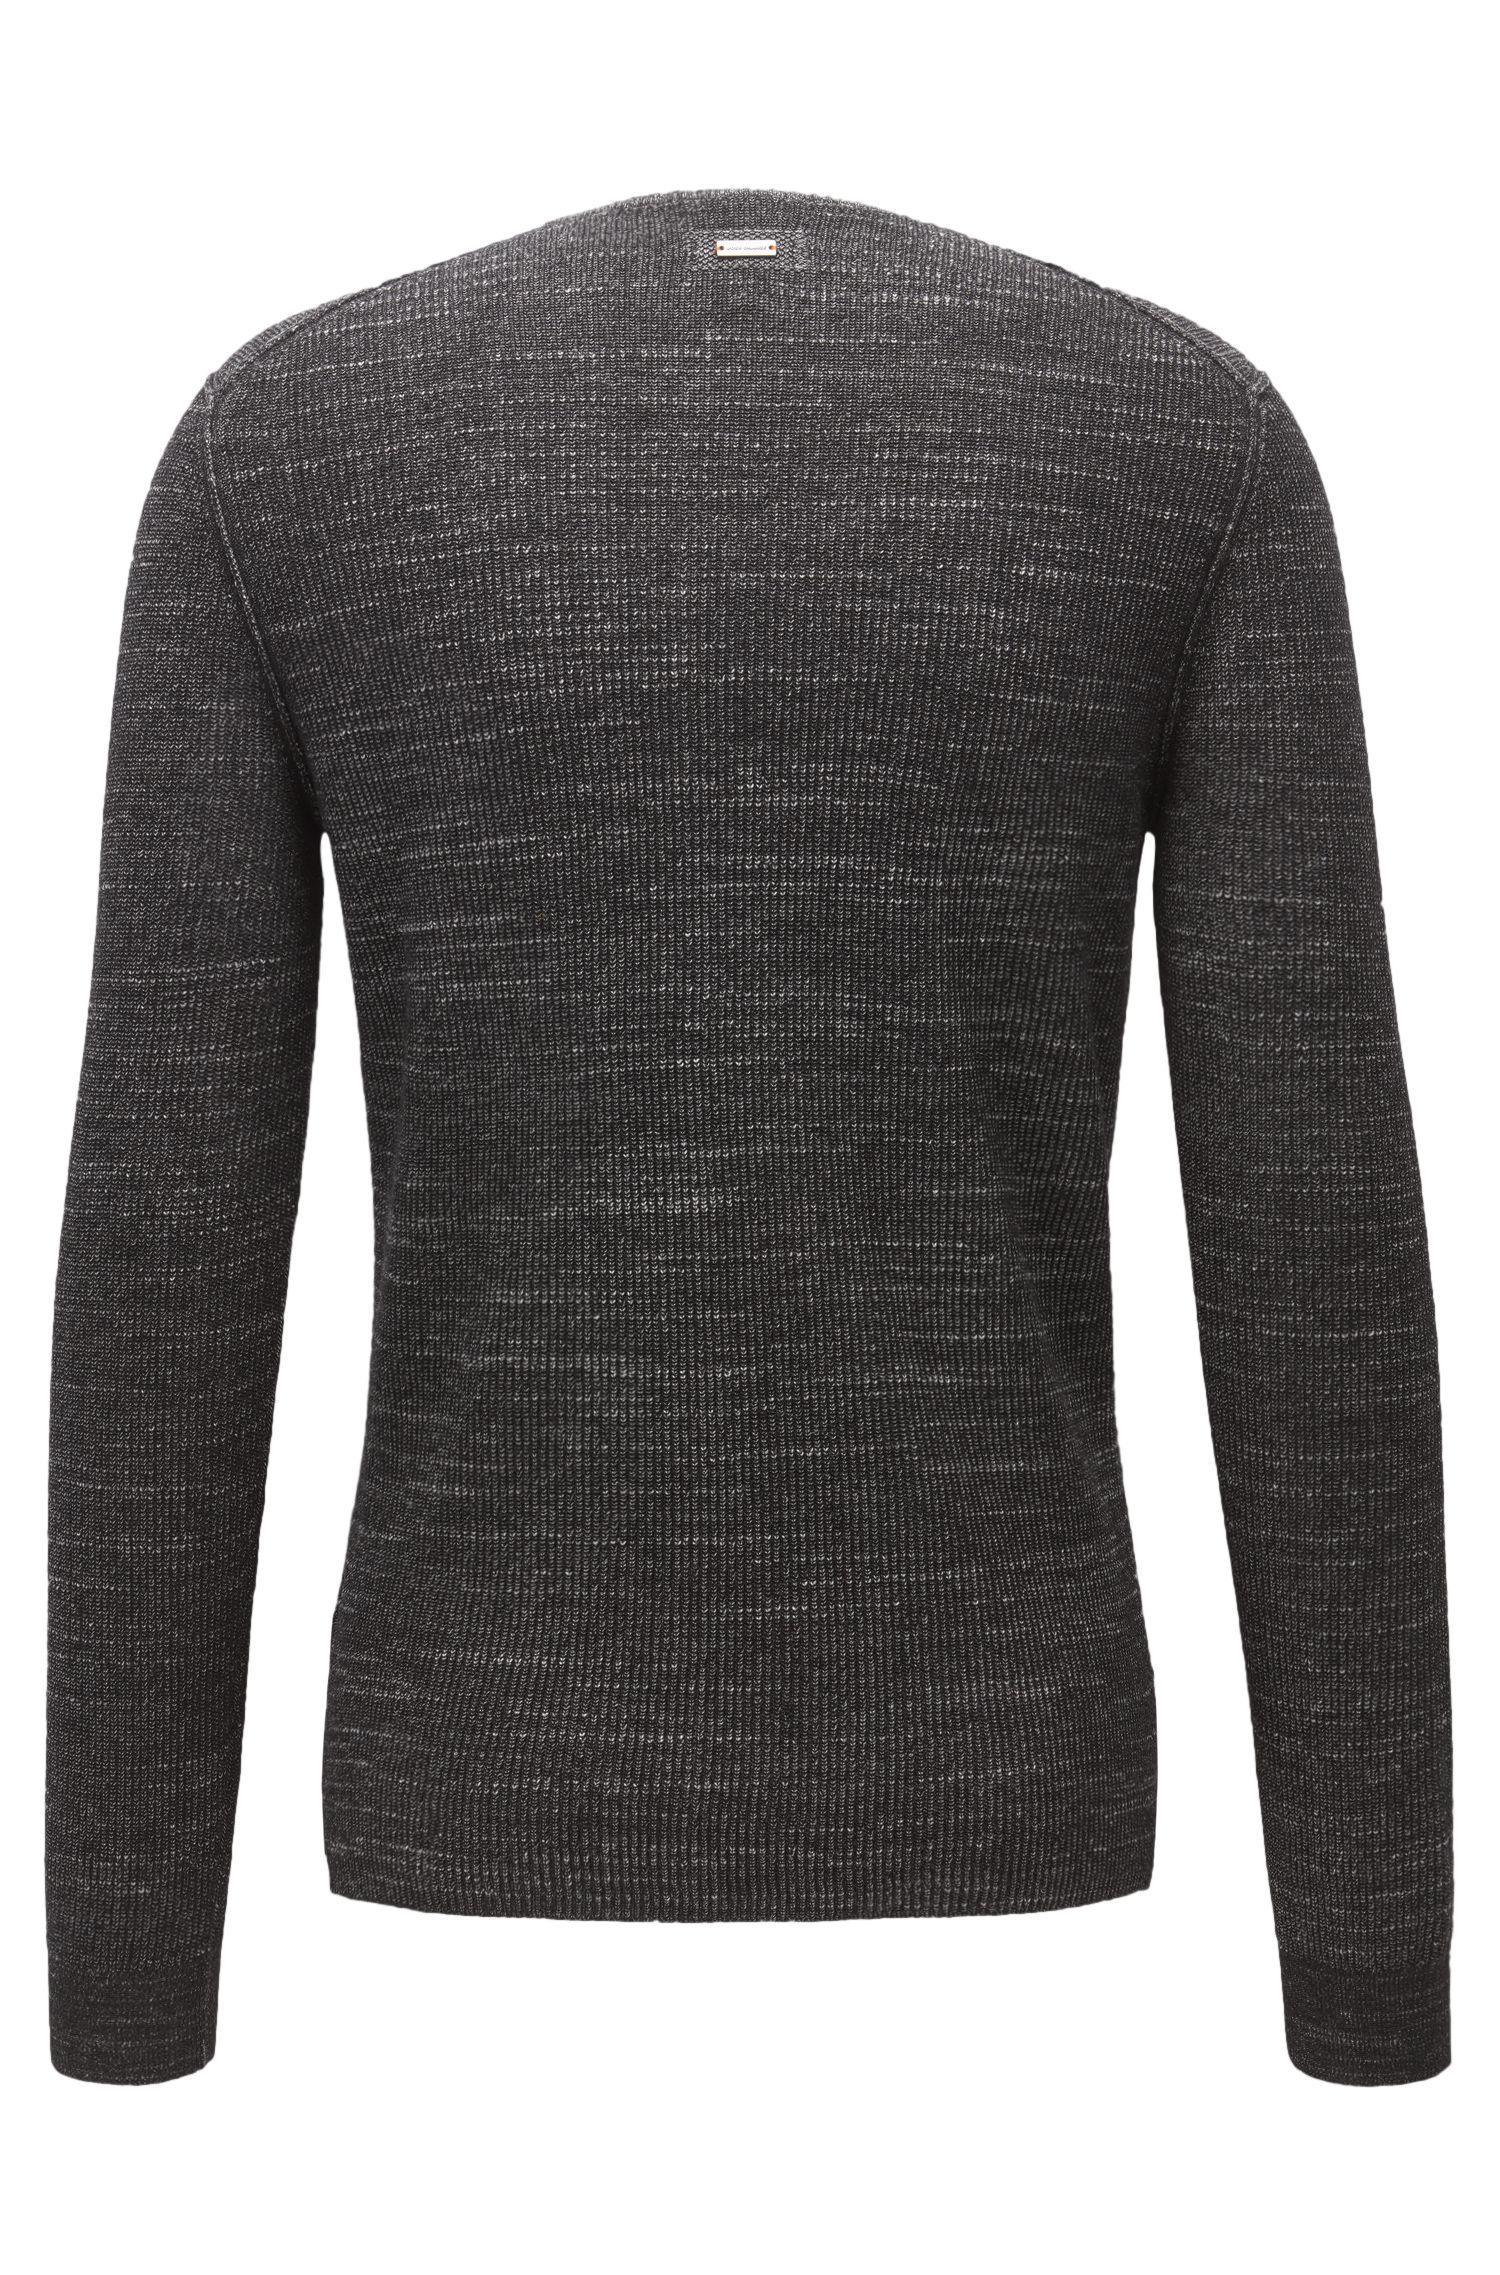 Cotton Blend Sweater | Kutask, Black